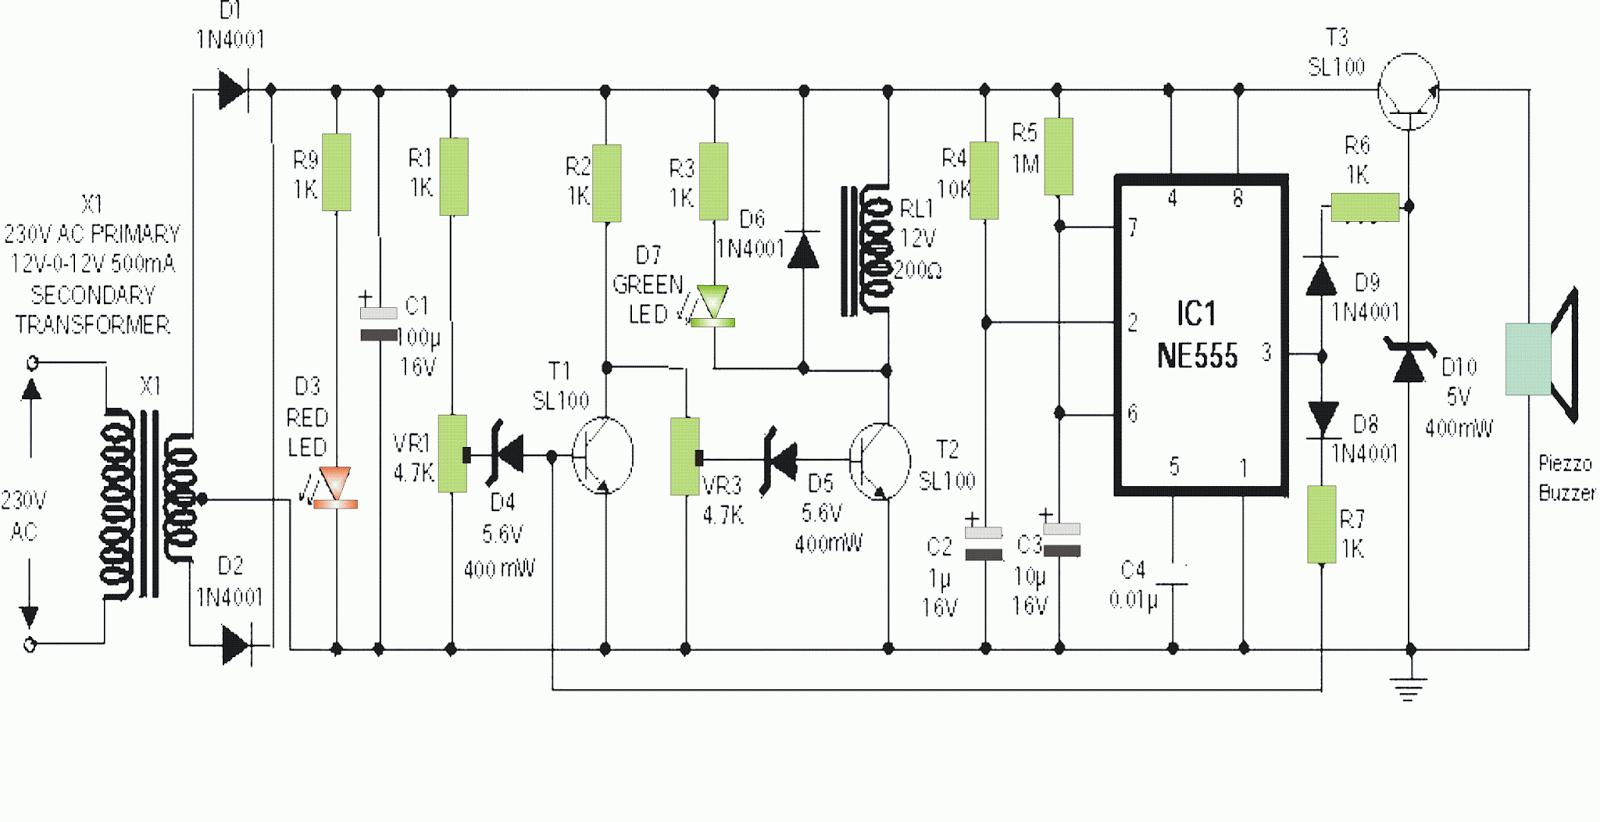 Simple Mains High Low Voltage Cut Off Circuit Schematics Lab Power Fm Transmitter Diagram